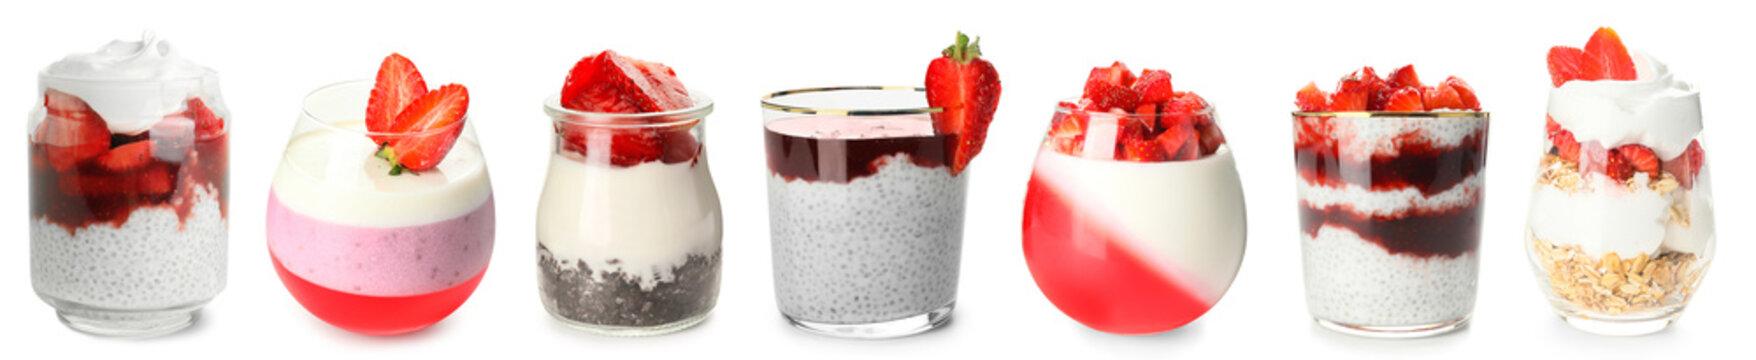 Tasty strawberry desserts in glassware on white background